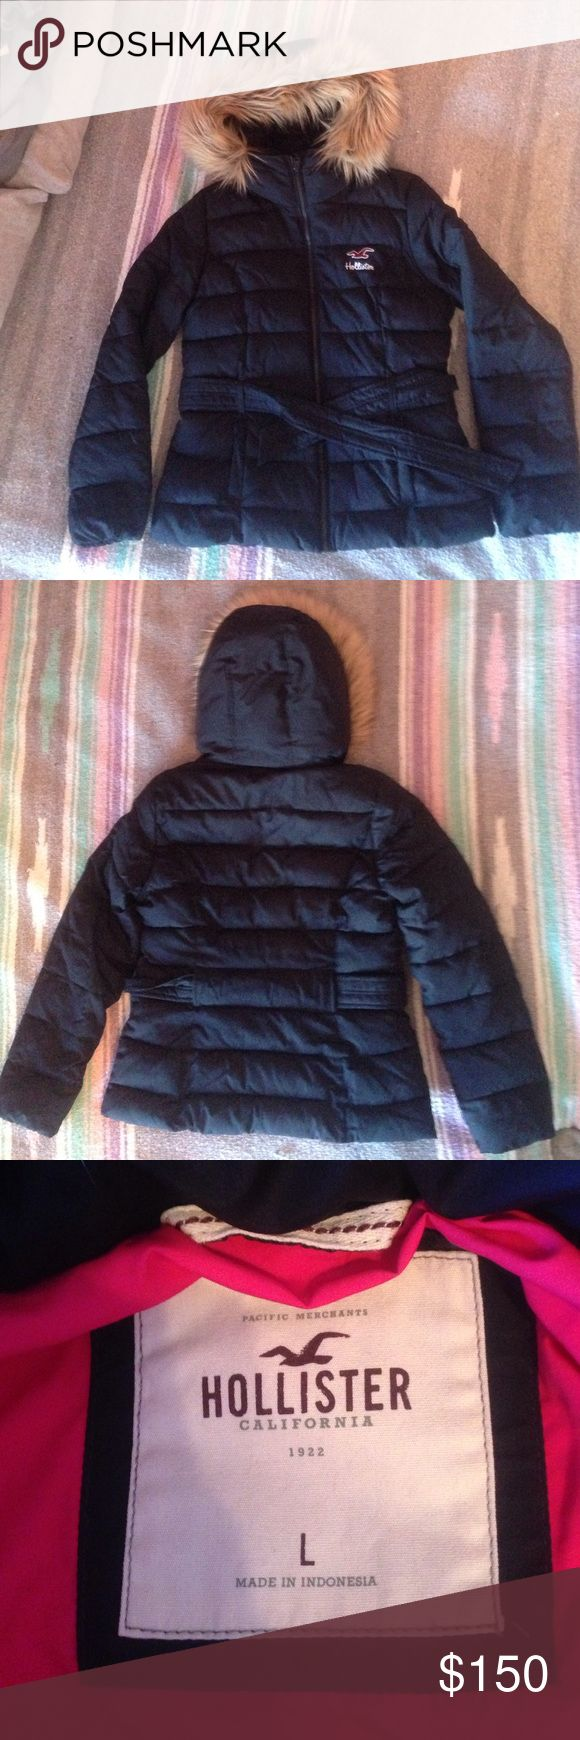 Navy blue Hollister coat size L w/ pink inside Lightly worn Womens hollister coat size Large. Removable fur. Feel free to make an offer. Hollister Jackets & Coats Puffers